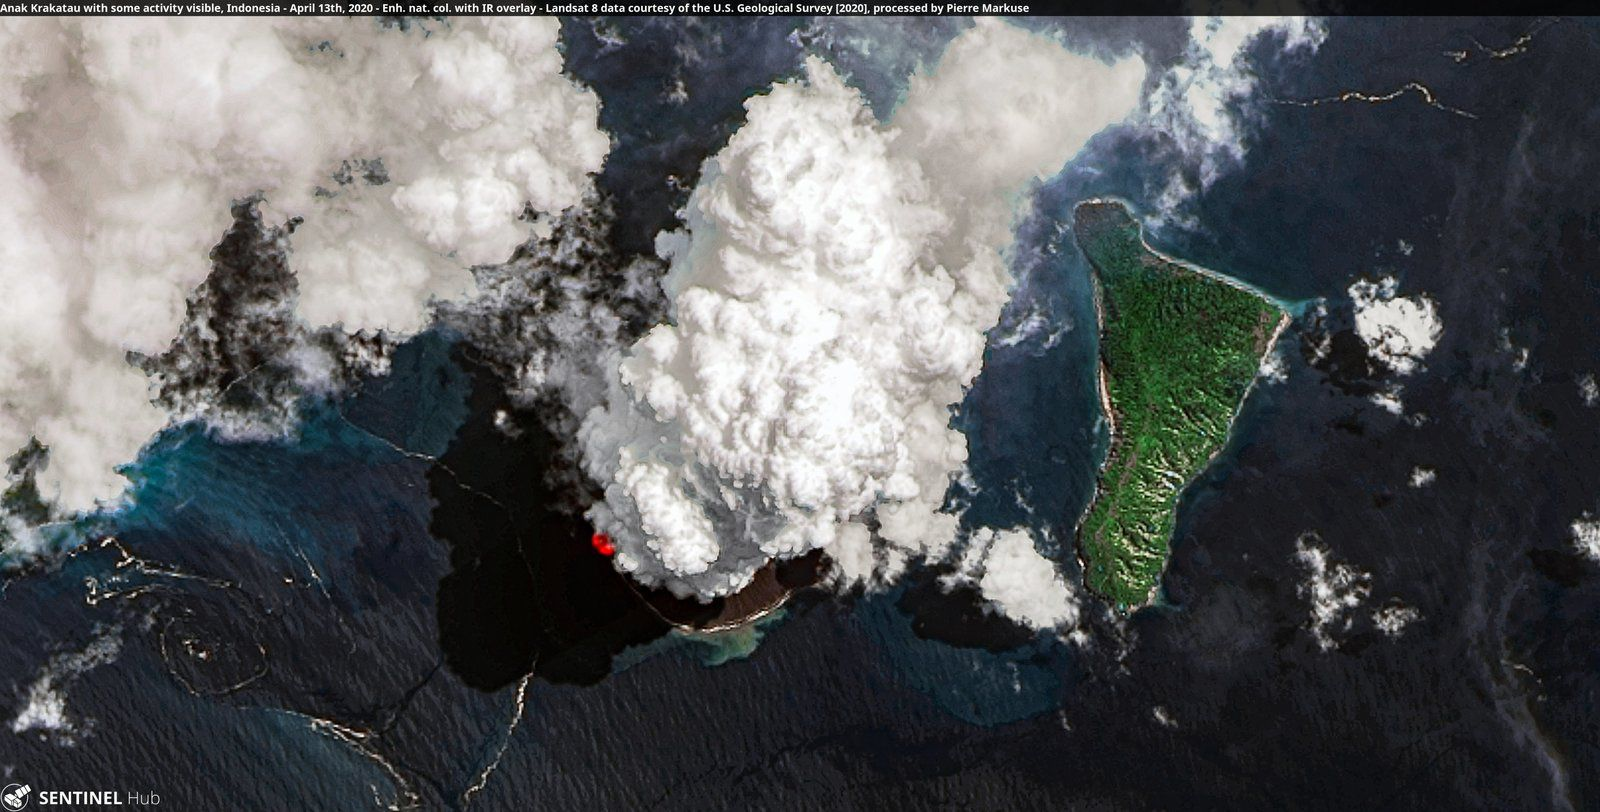 Anak Krakatau - image Sentinel 2 + data Landsat 8 / USGS - Doc. Pierre Markuse - un clic pour agrandir